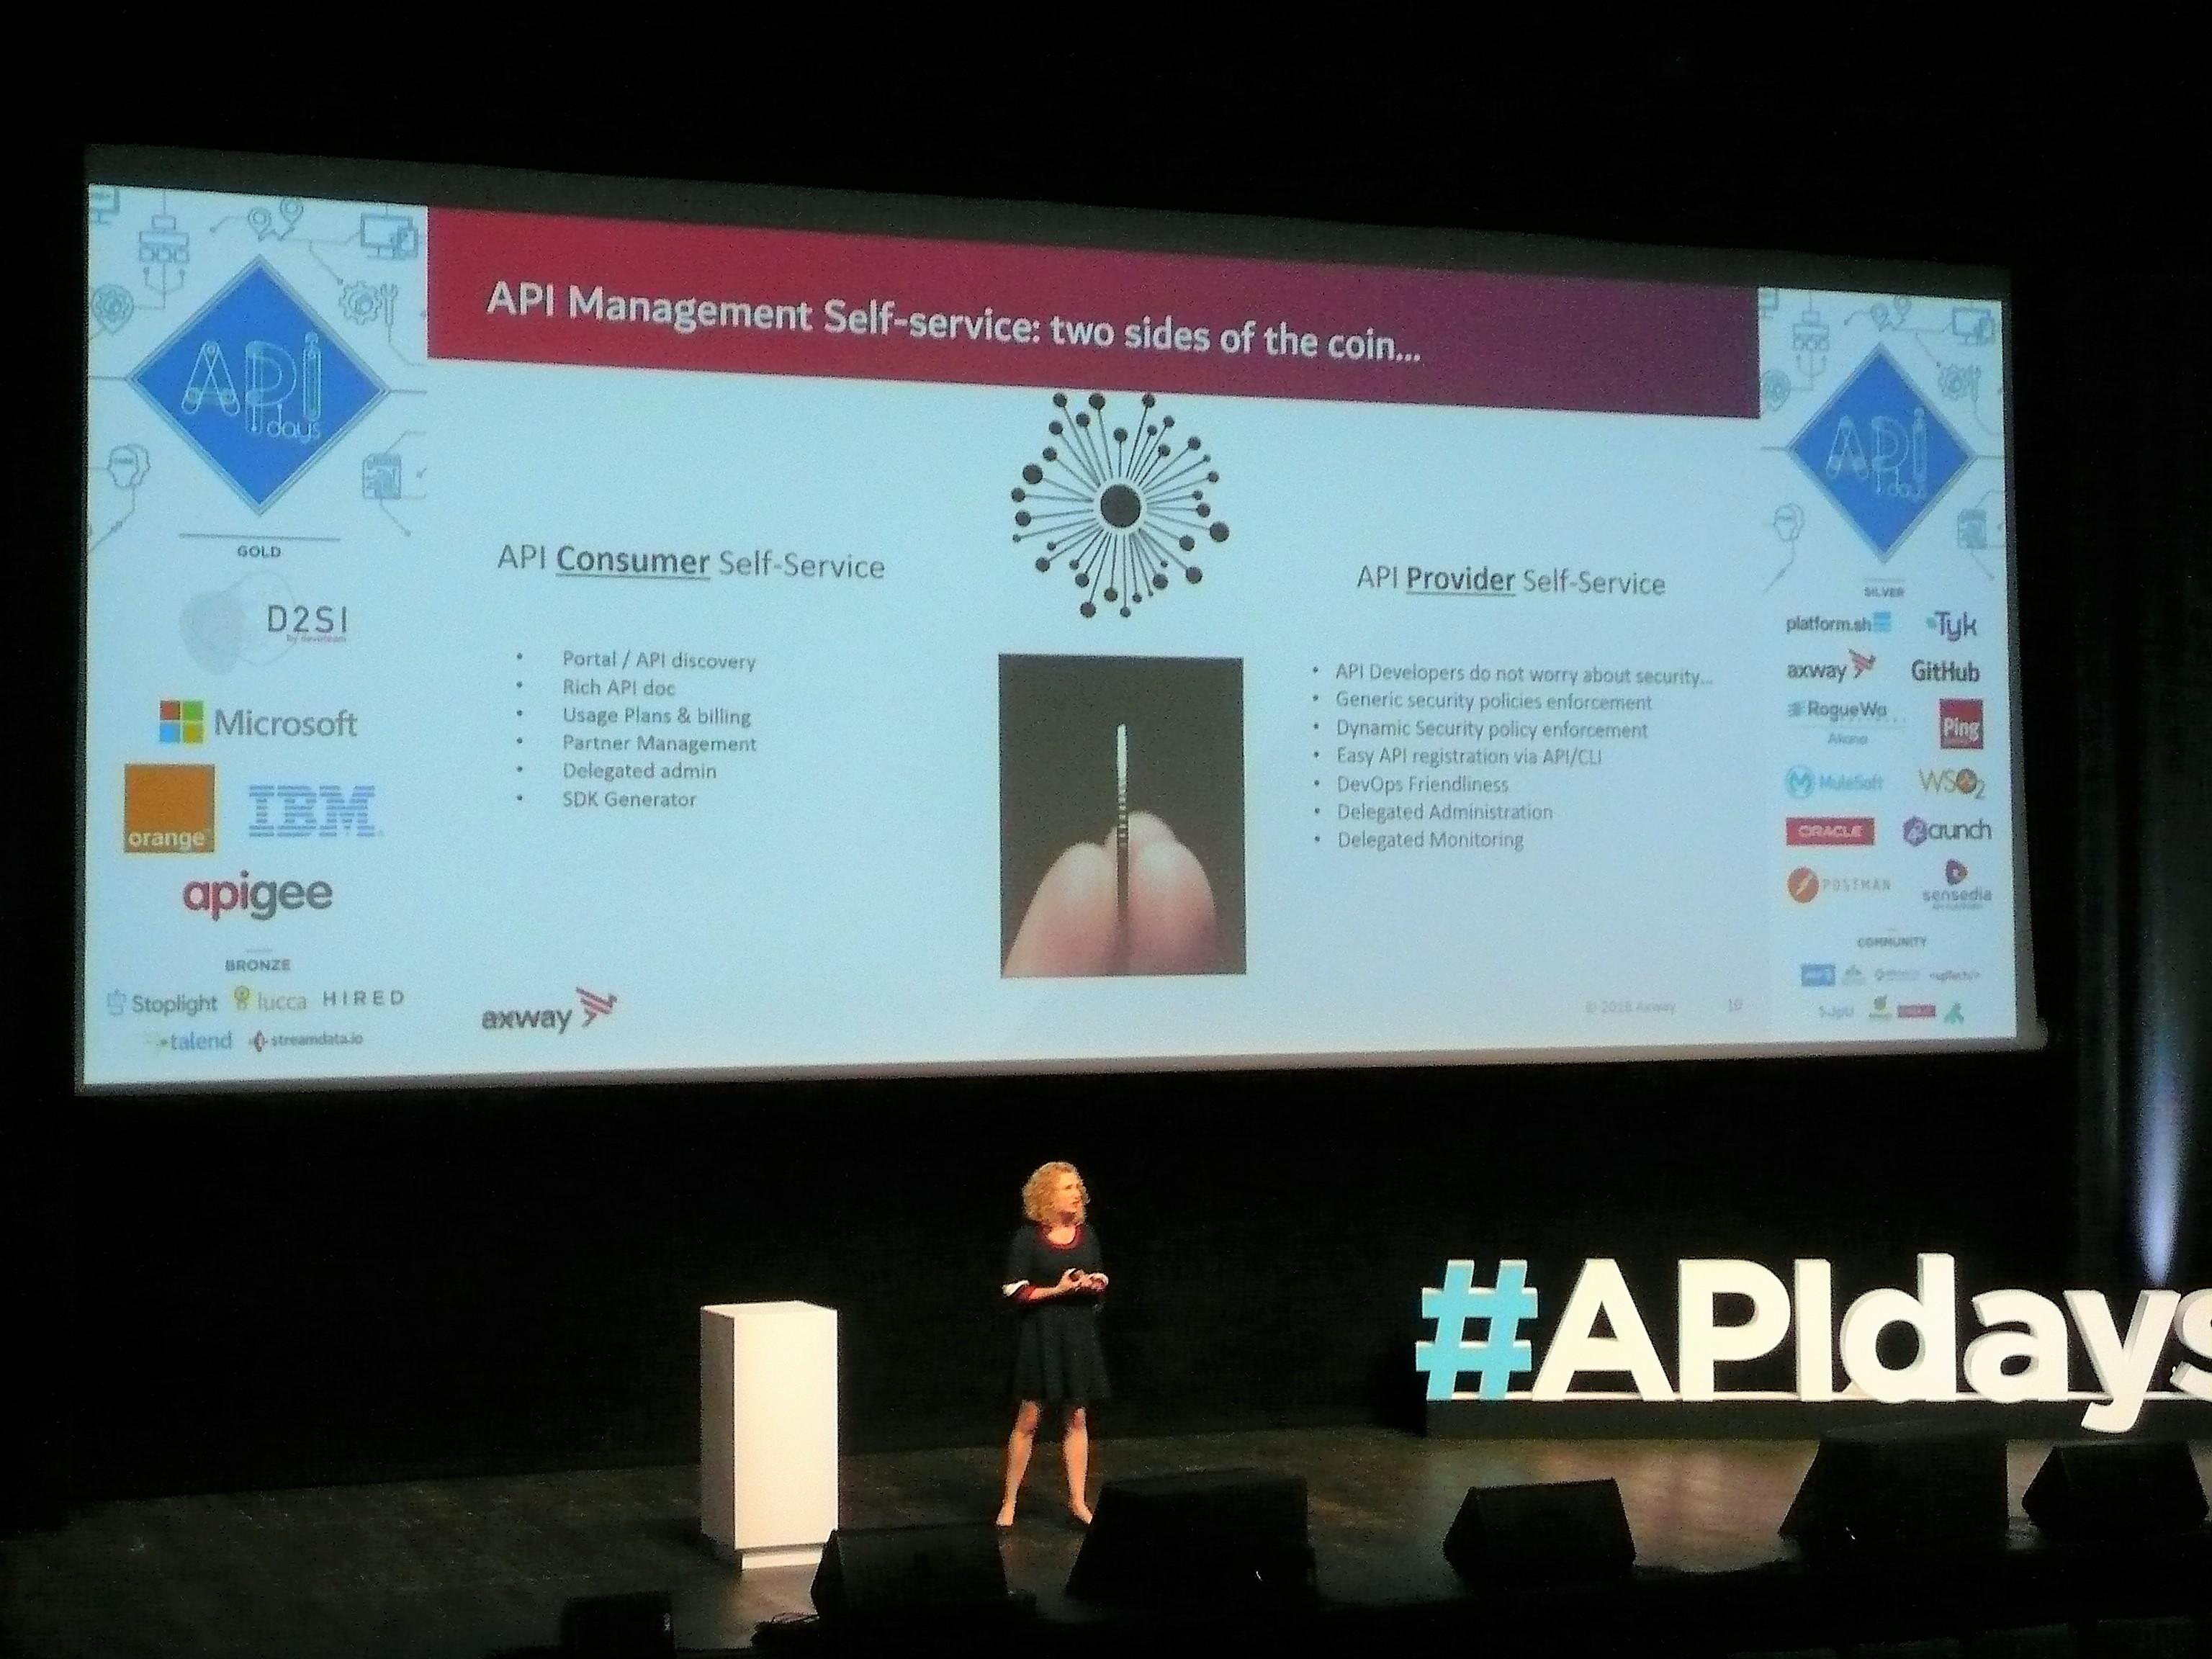 APIdays event